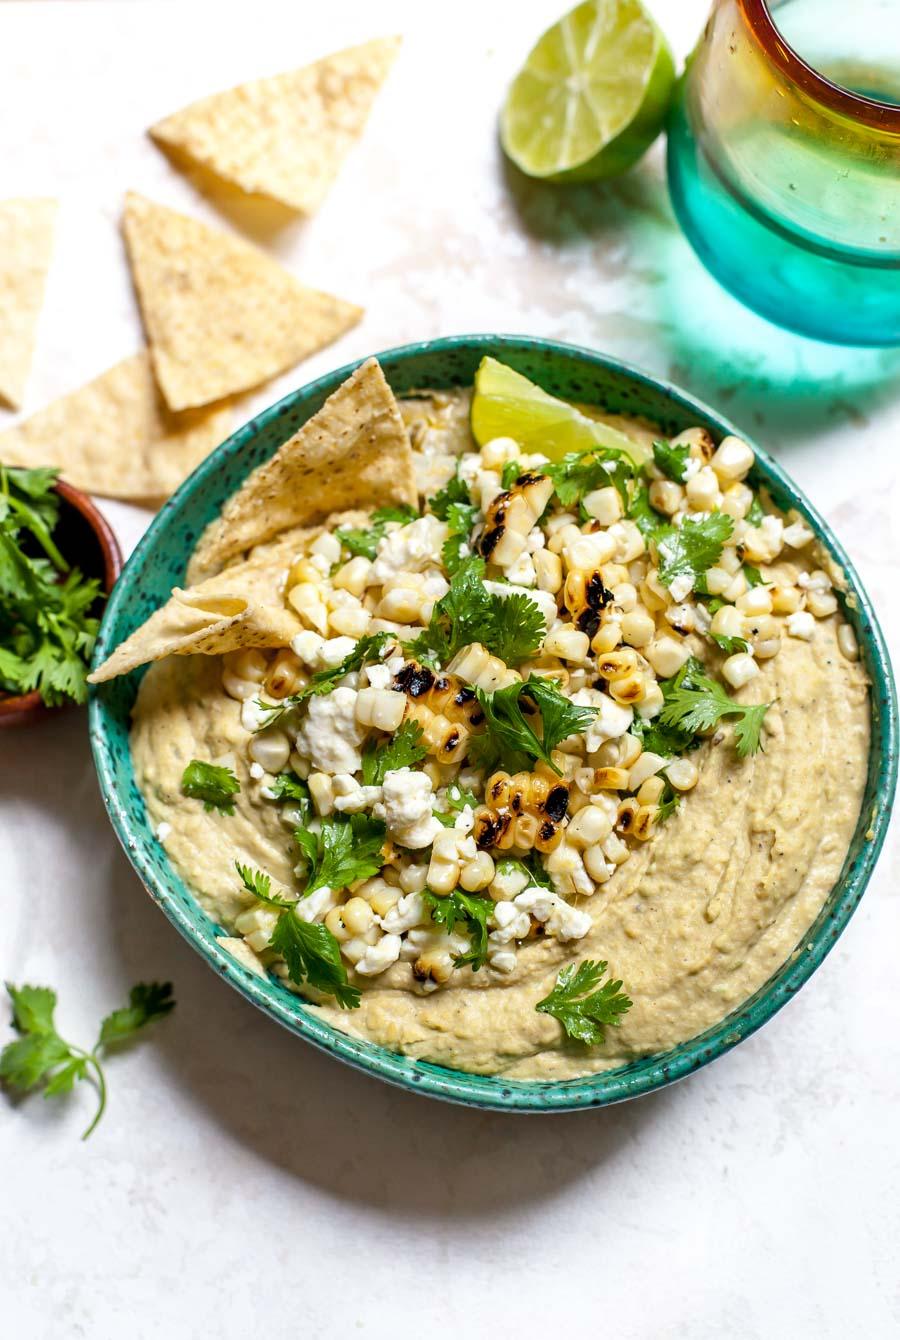 Charred Jalapeño Hummus with Corn and Feta